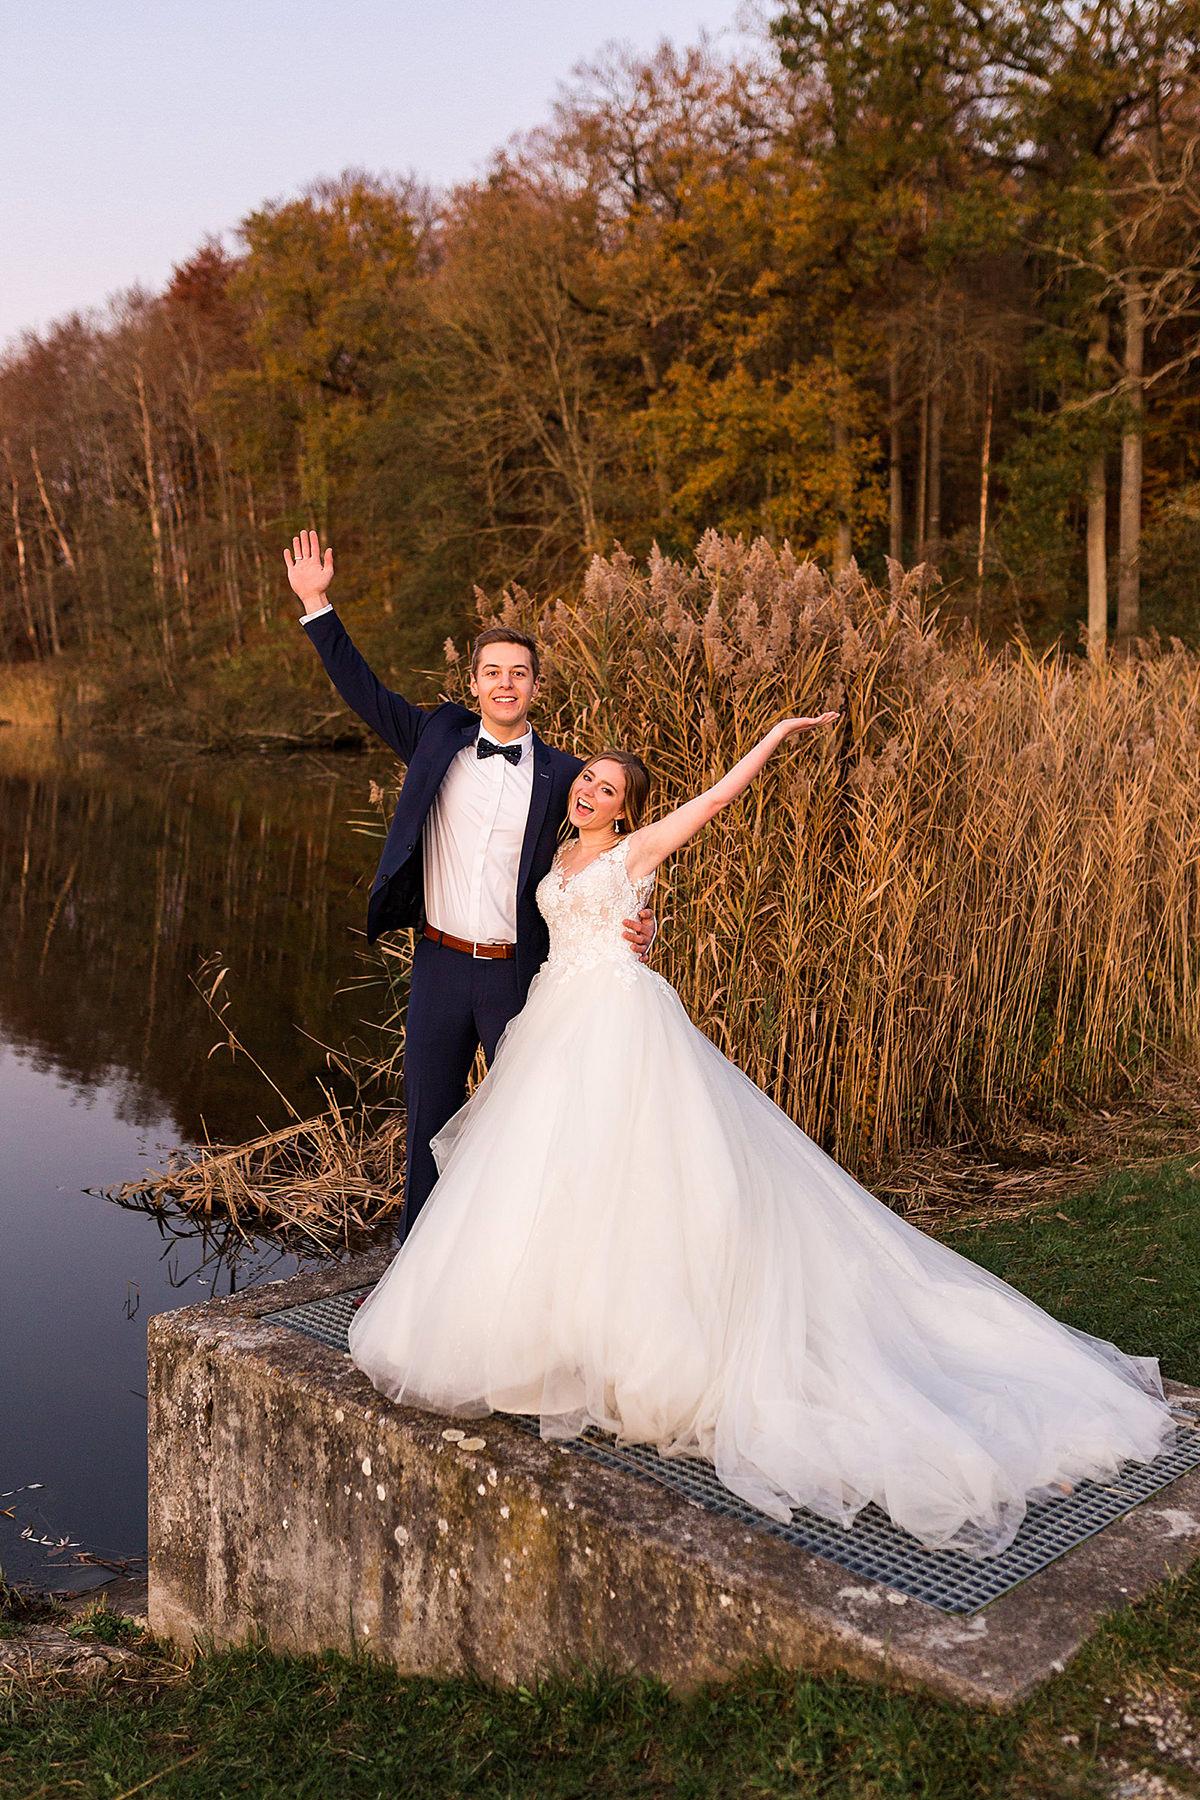 Brautpaarshooting mit Fotografin Daniela Knipper in Crailsheim